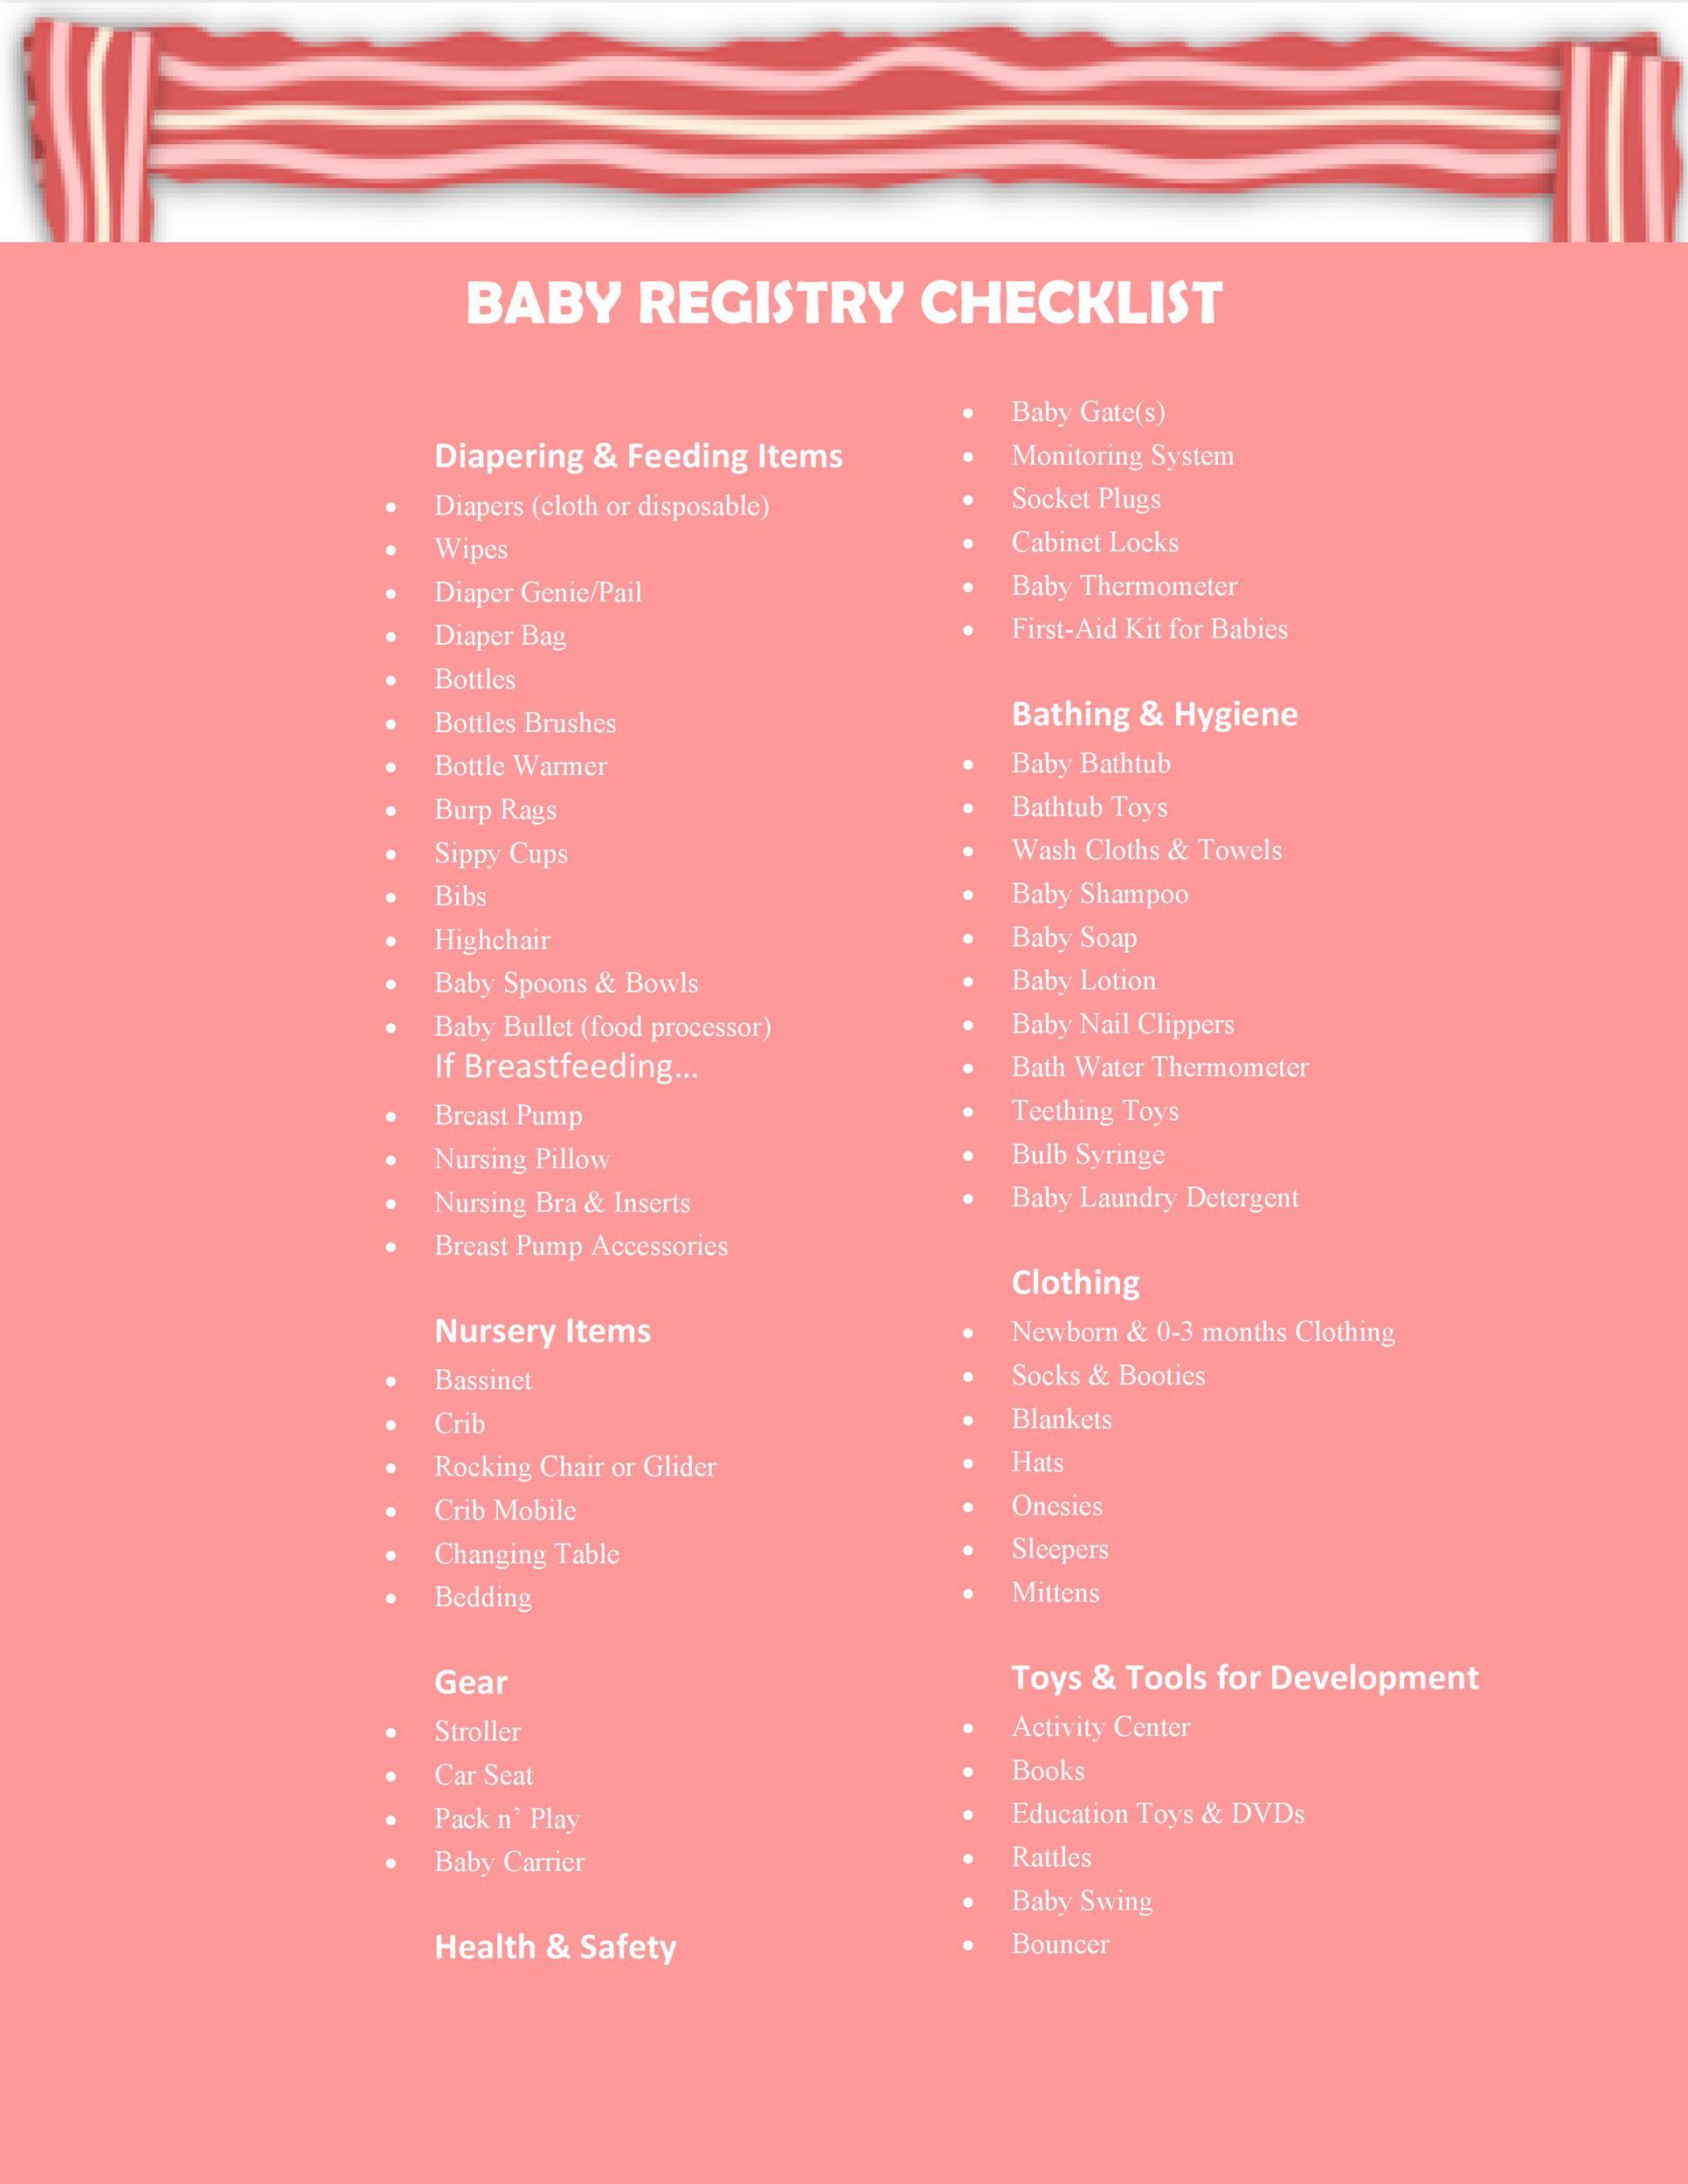 Free Baby Registry Checklist 21